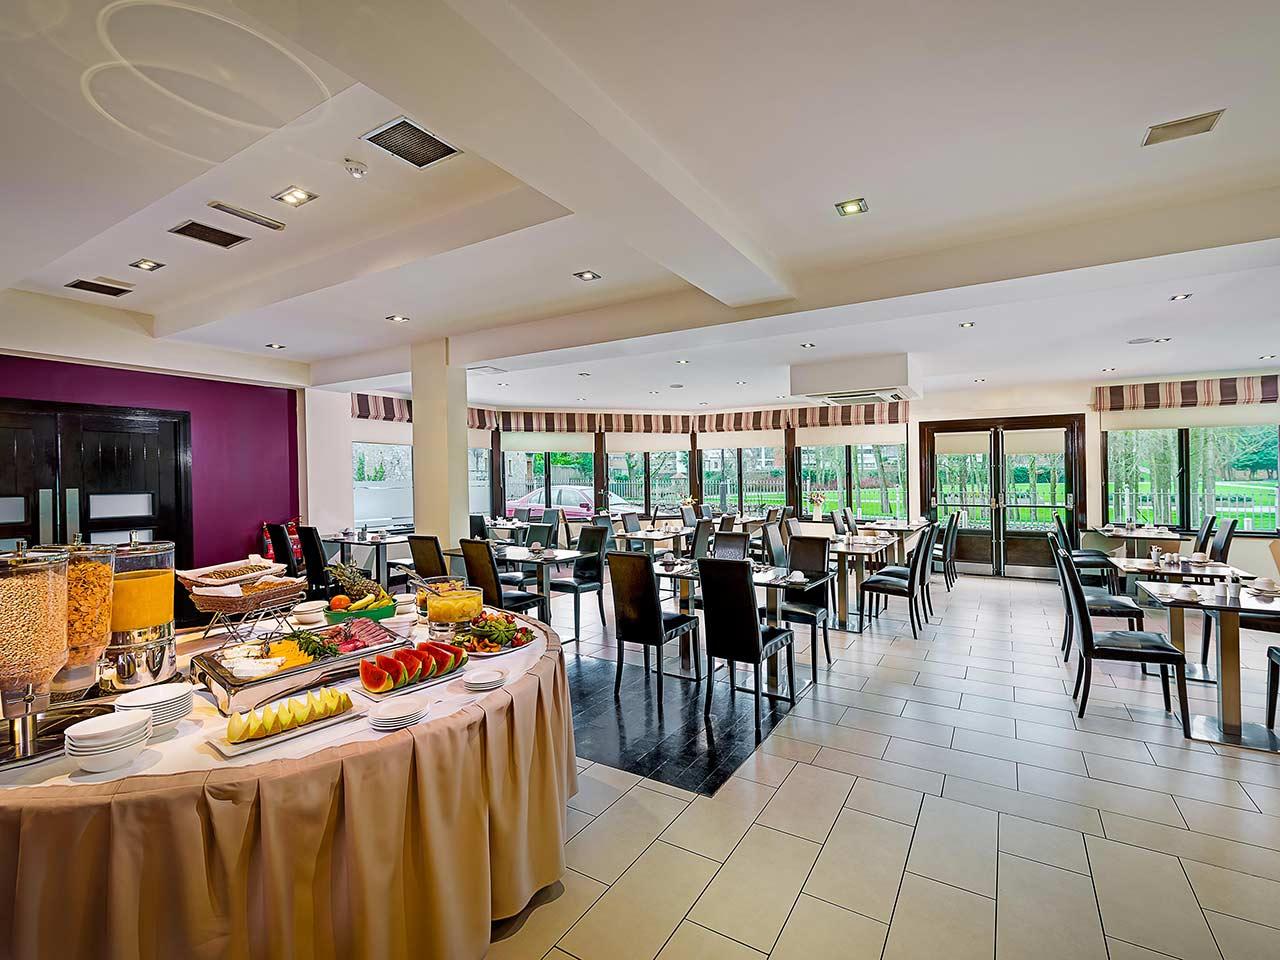 Central Hotel Tullamore - Reviews, Photos & Rates | uselesspenguin.co.uk